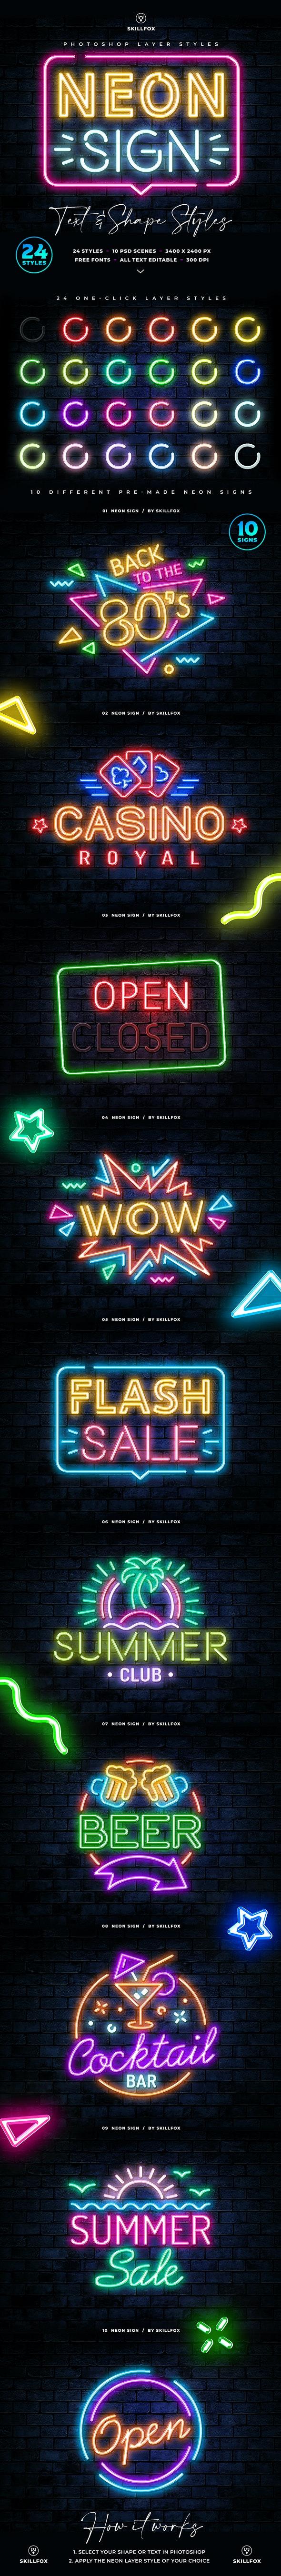 Neon Sign Photoshop Styles